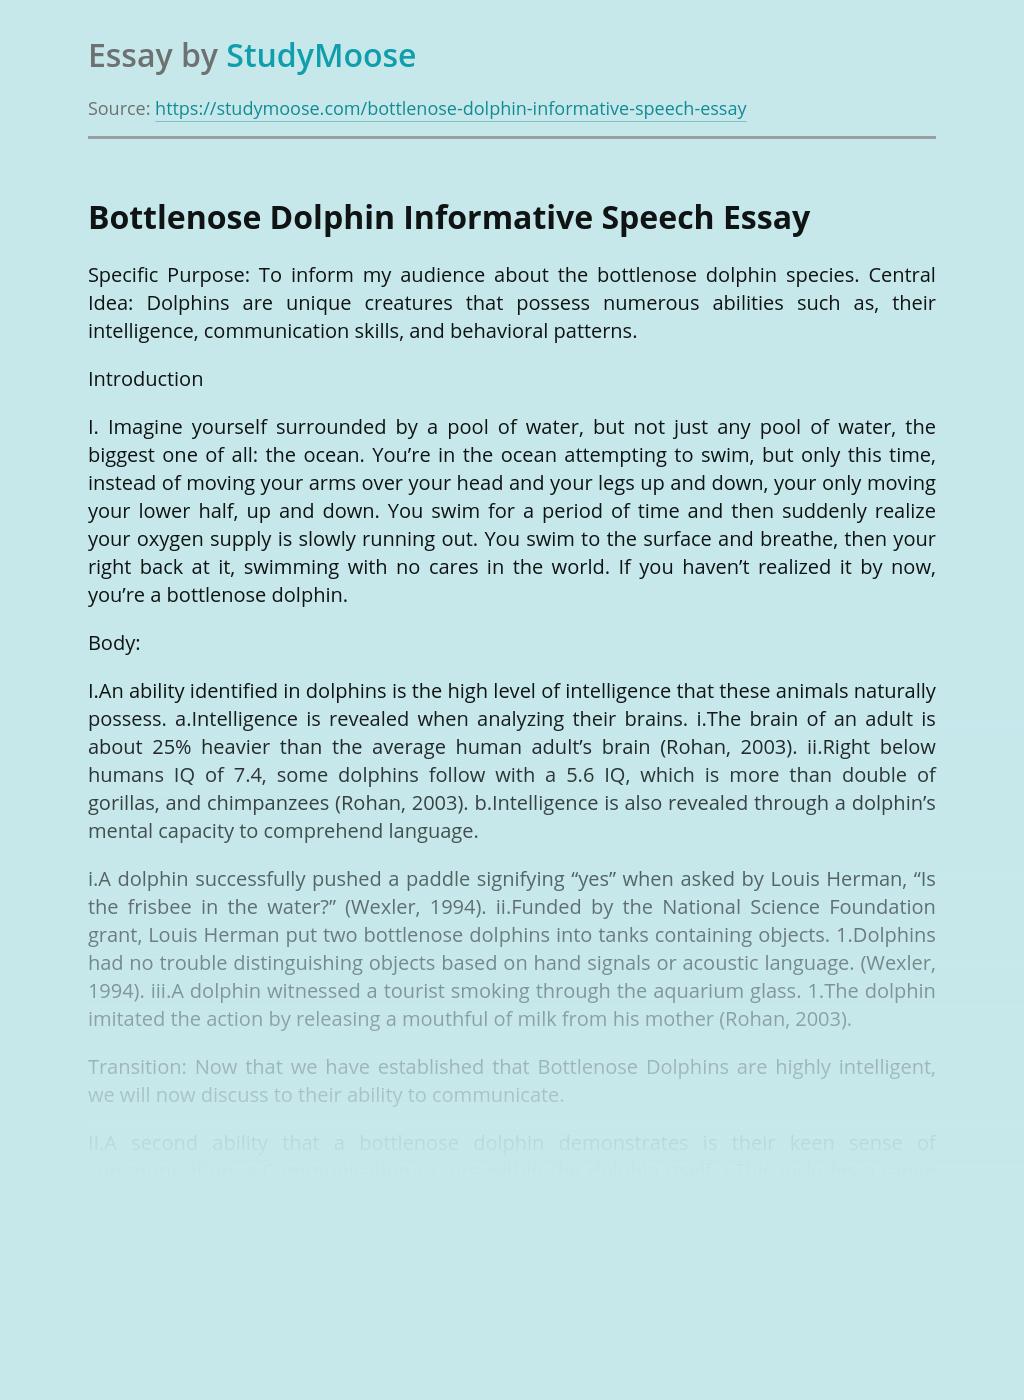 Bottlenose Dolphin Informative Speech